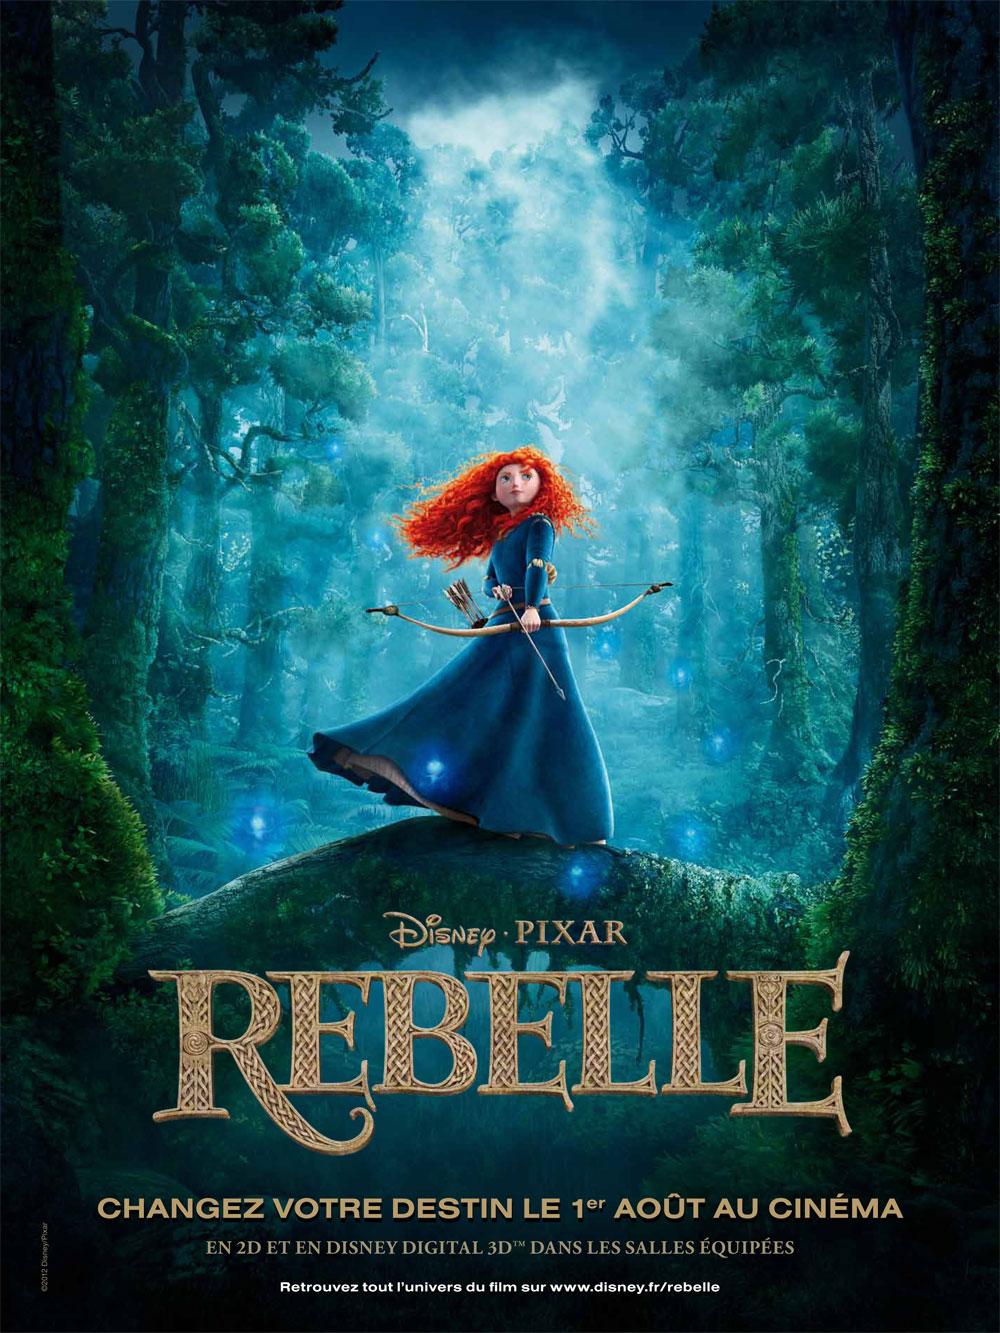 Disney pixar rebelle la petite mu qui plume for 3d film archive